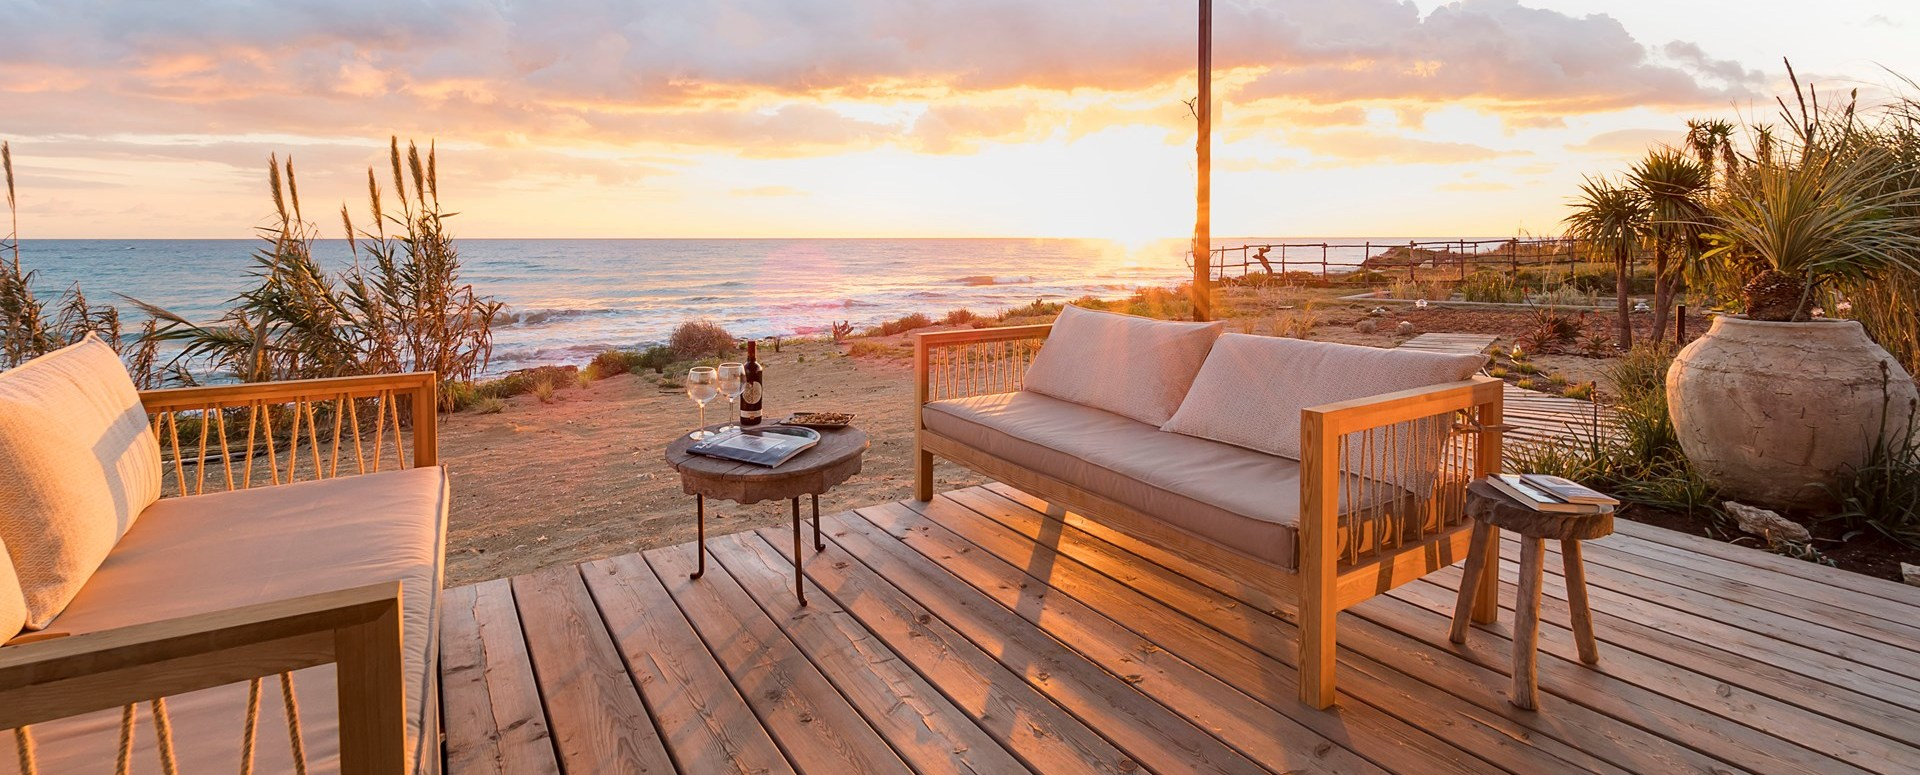 luxury-villas-sicily